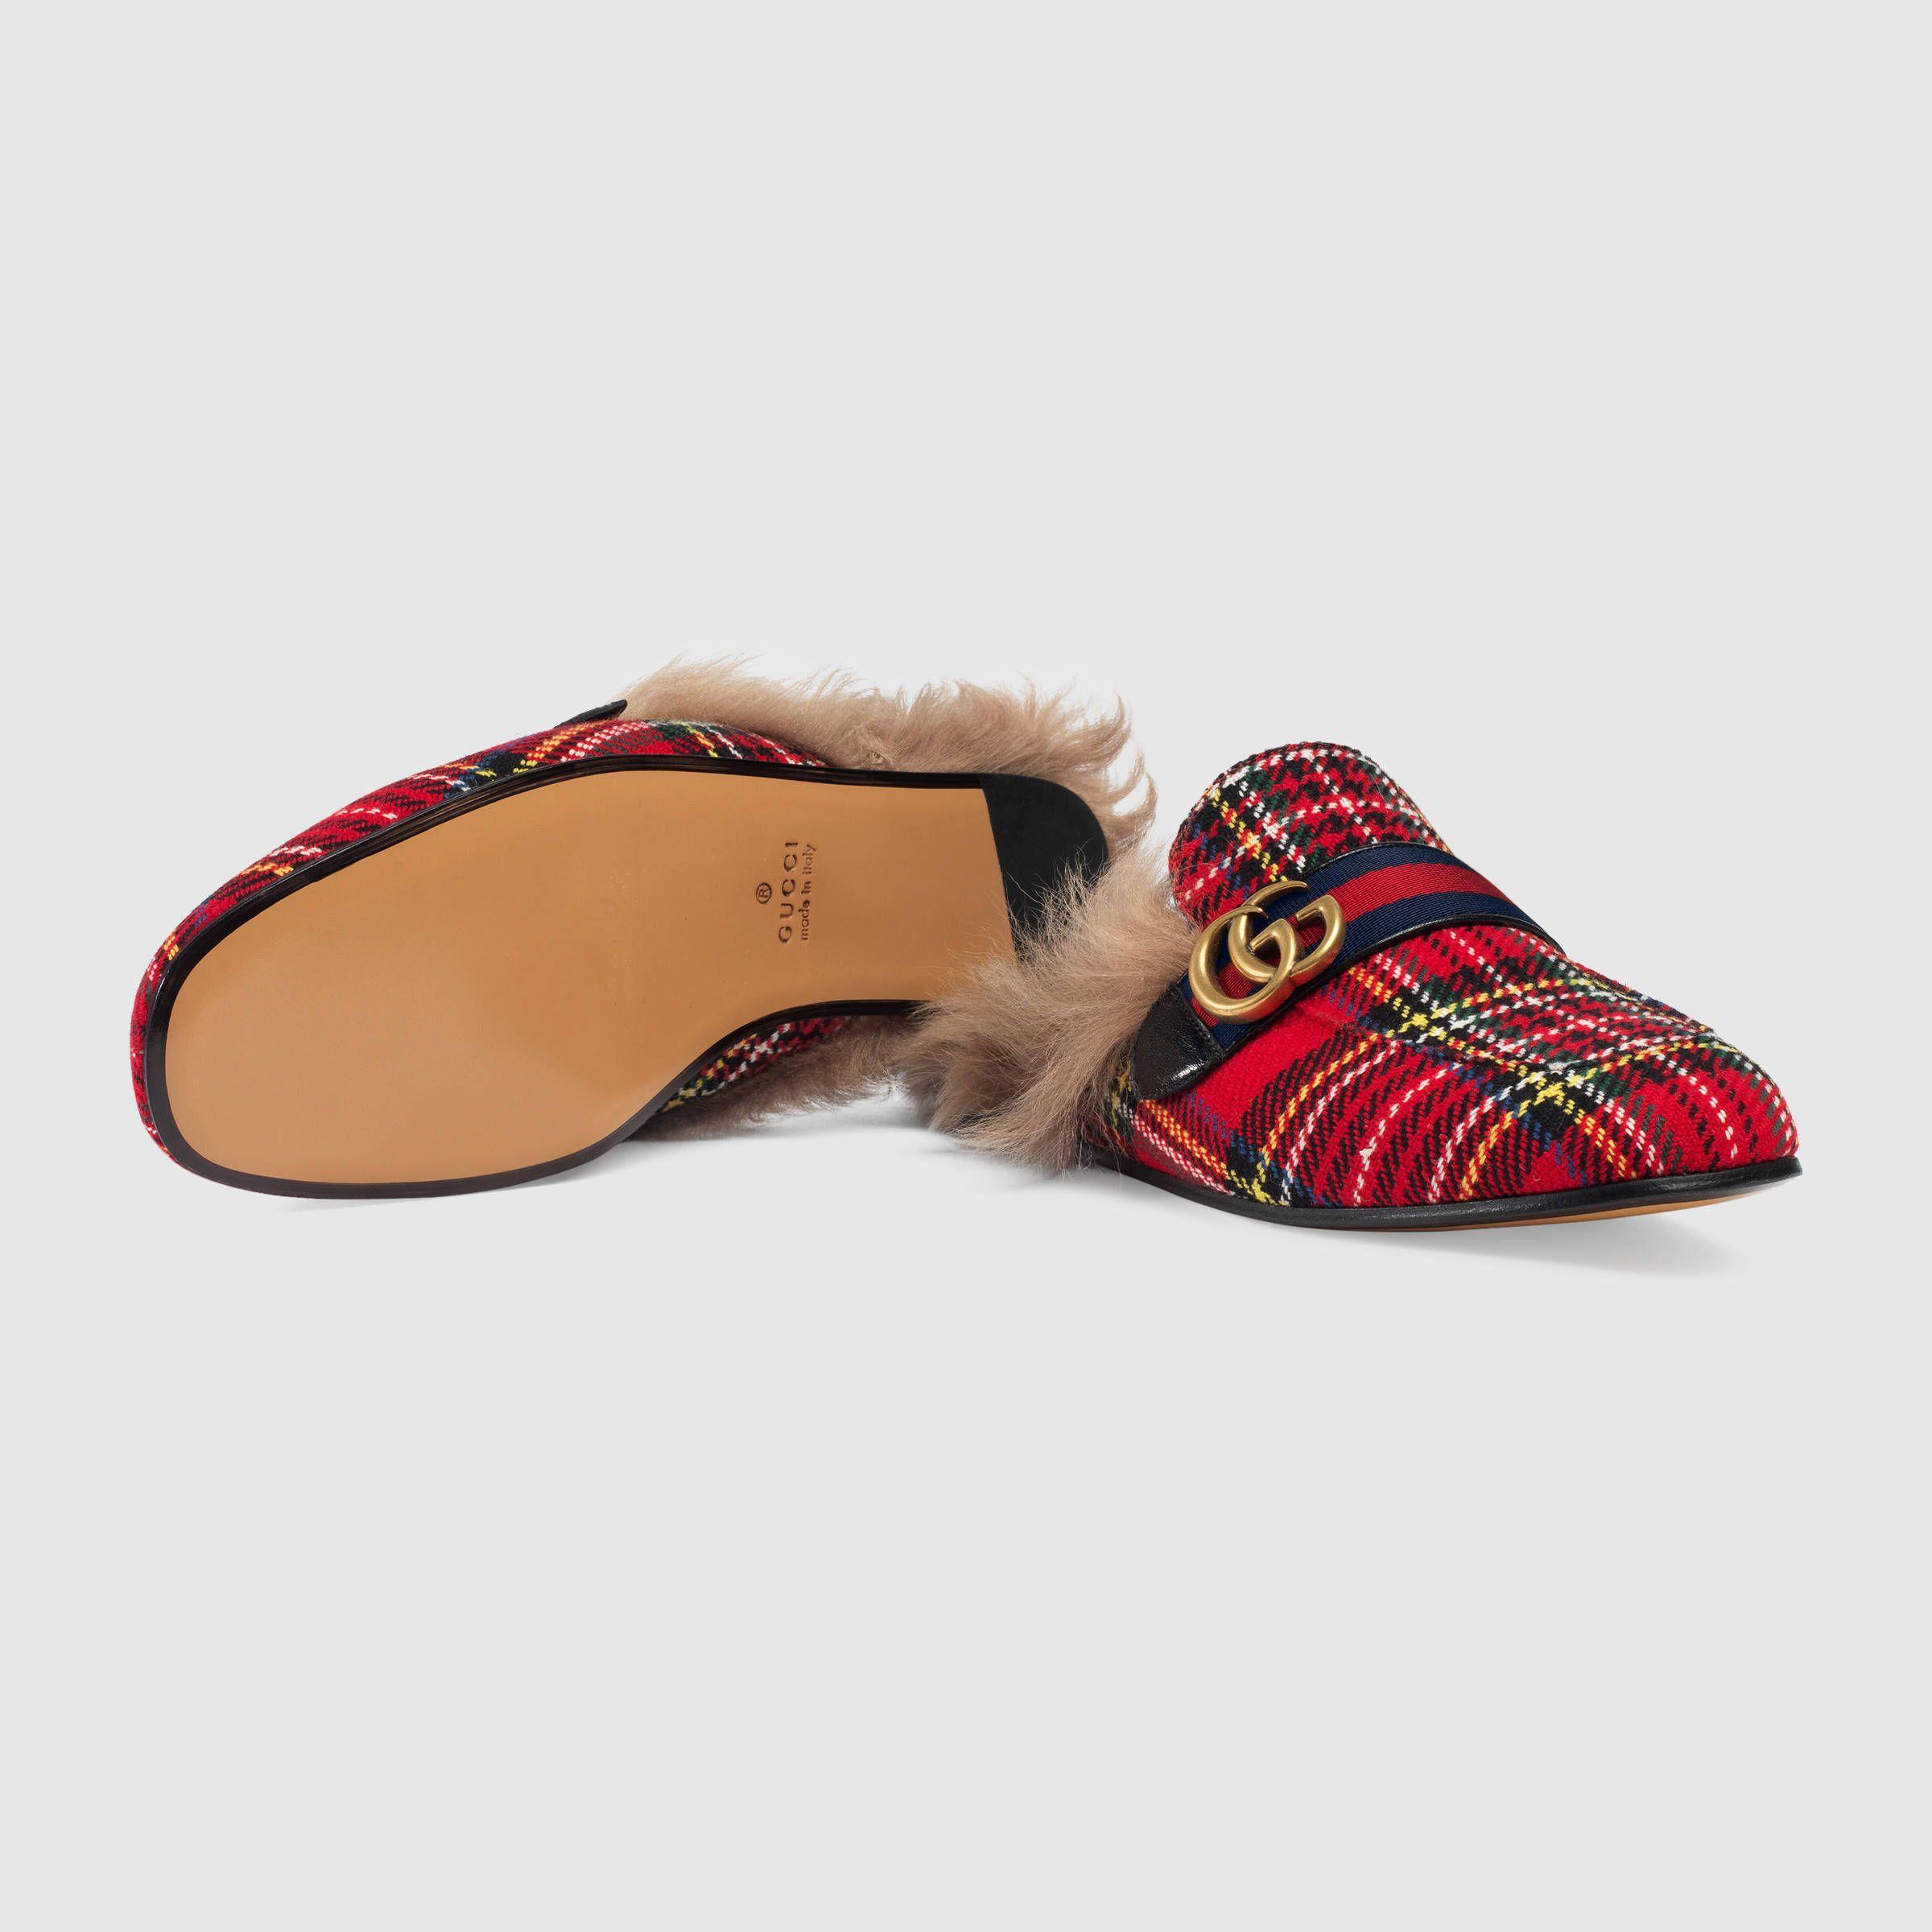 Gucci Princetown tartan slipper with